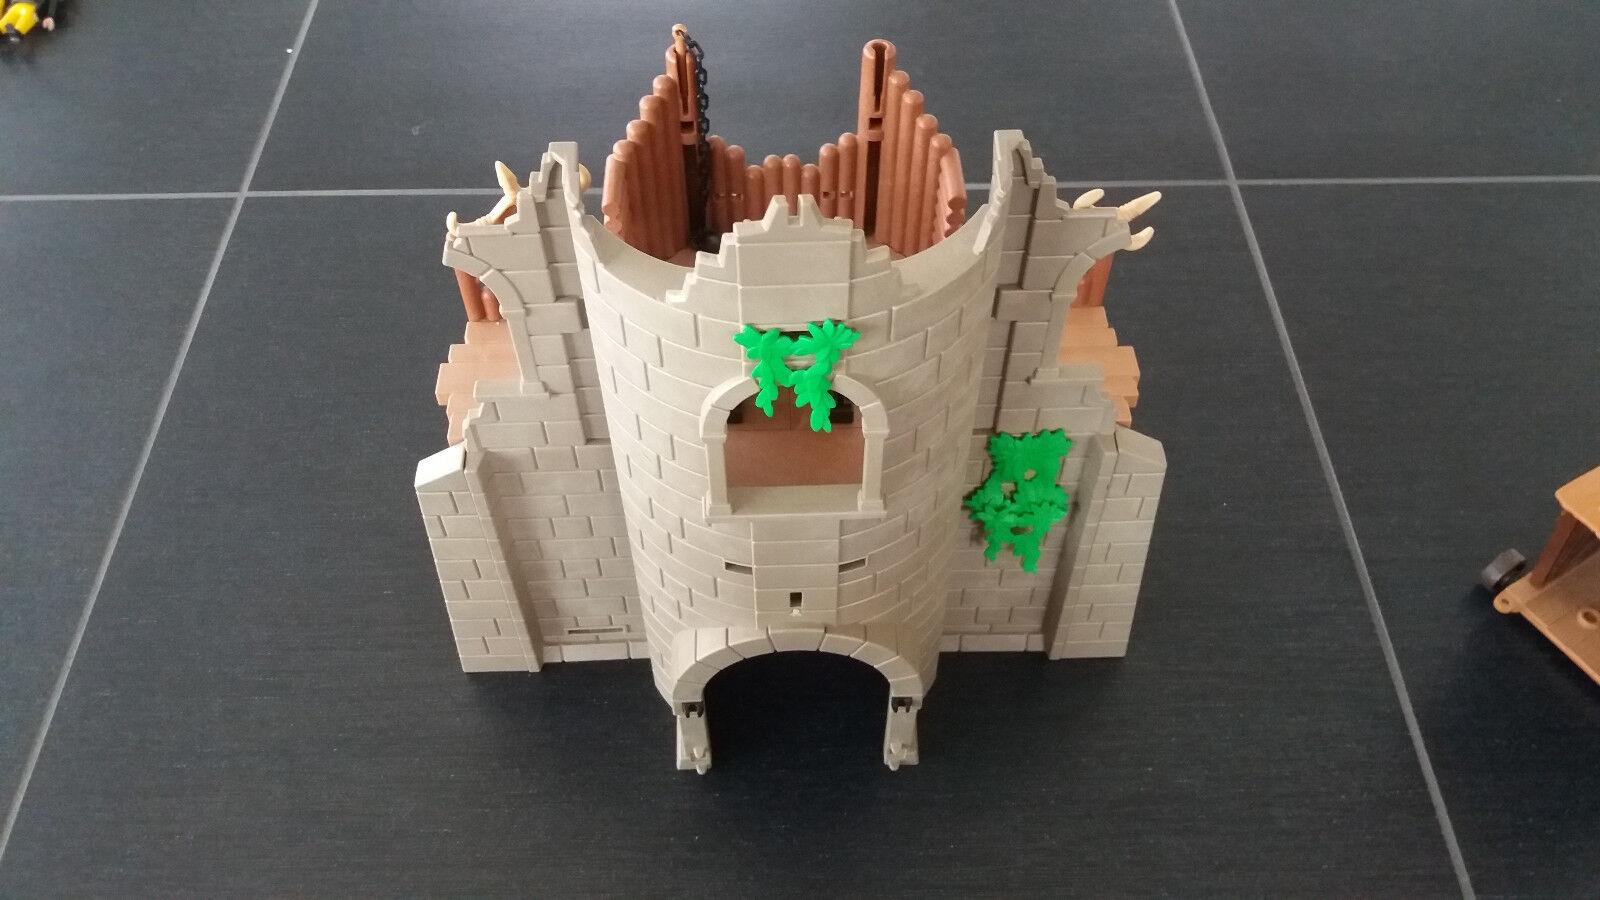 PLAYMOBIL   Riesiges Konvolut   Ritter   Pferde   Burg   Turm   Waffen      Heißer Verkauf